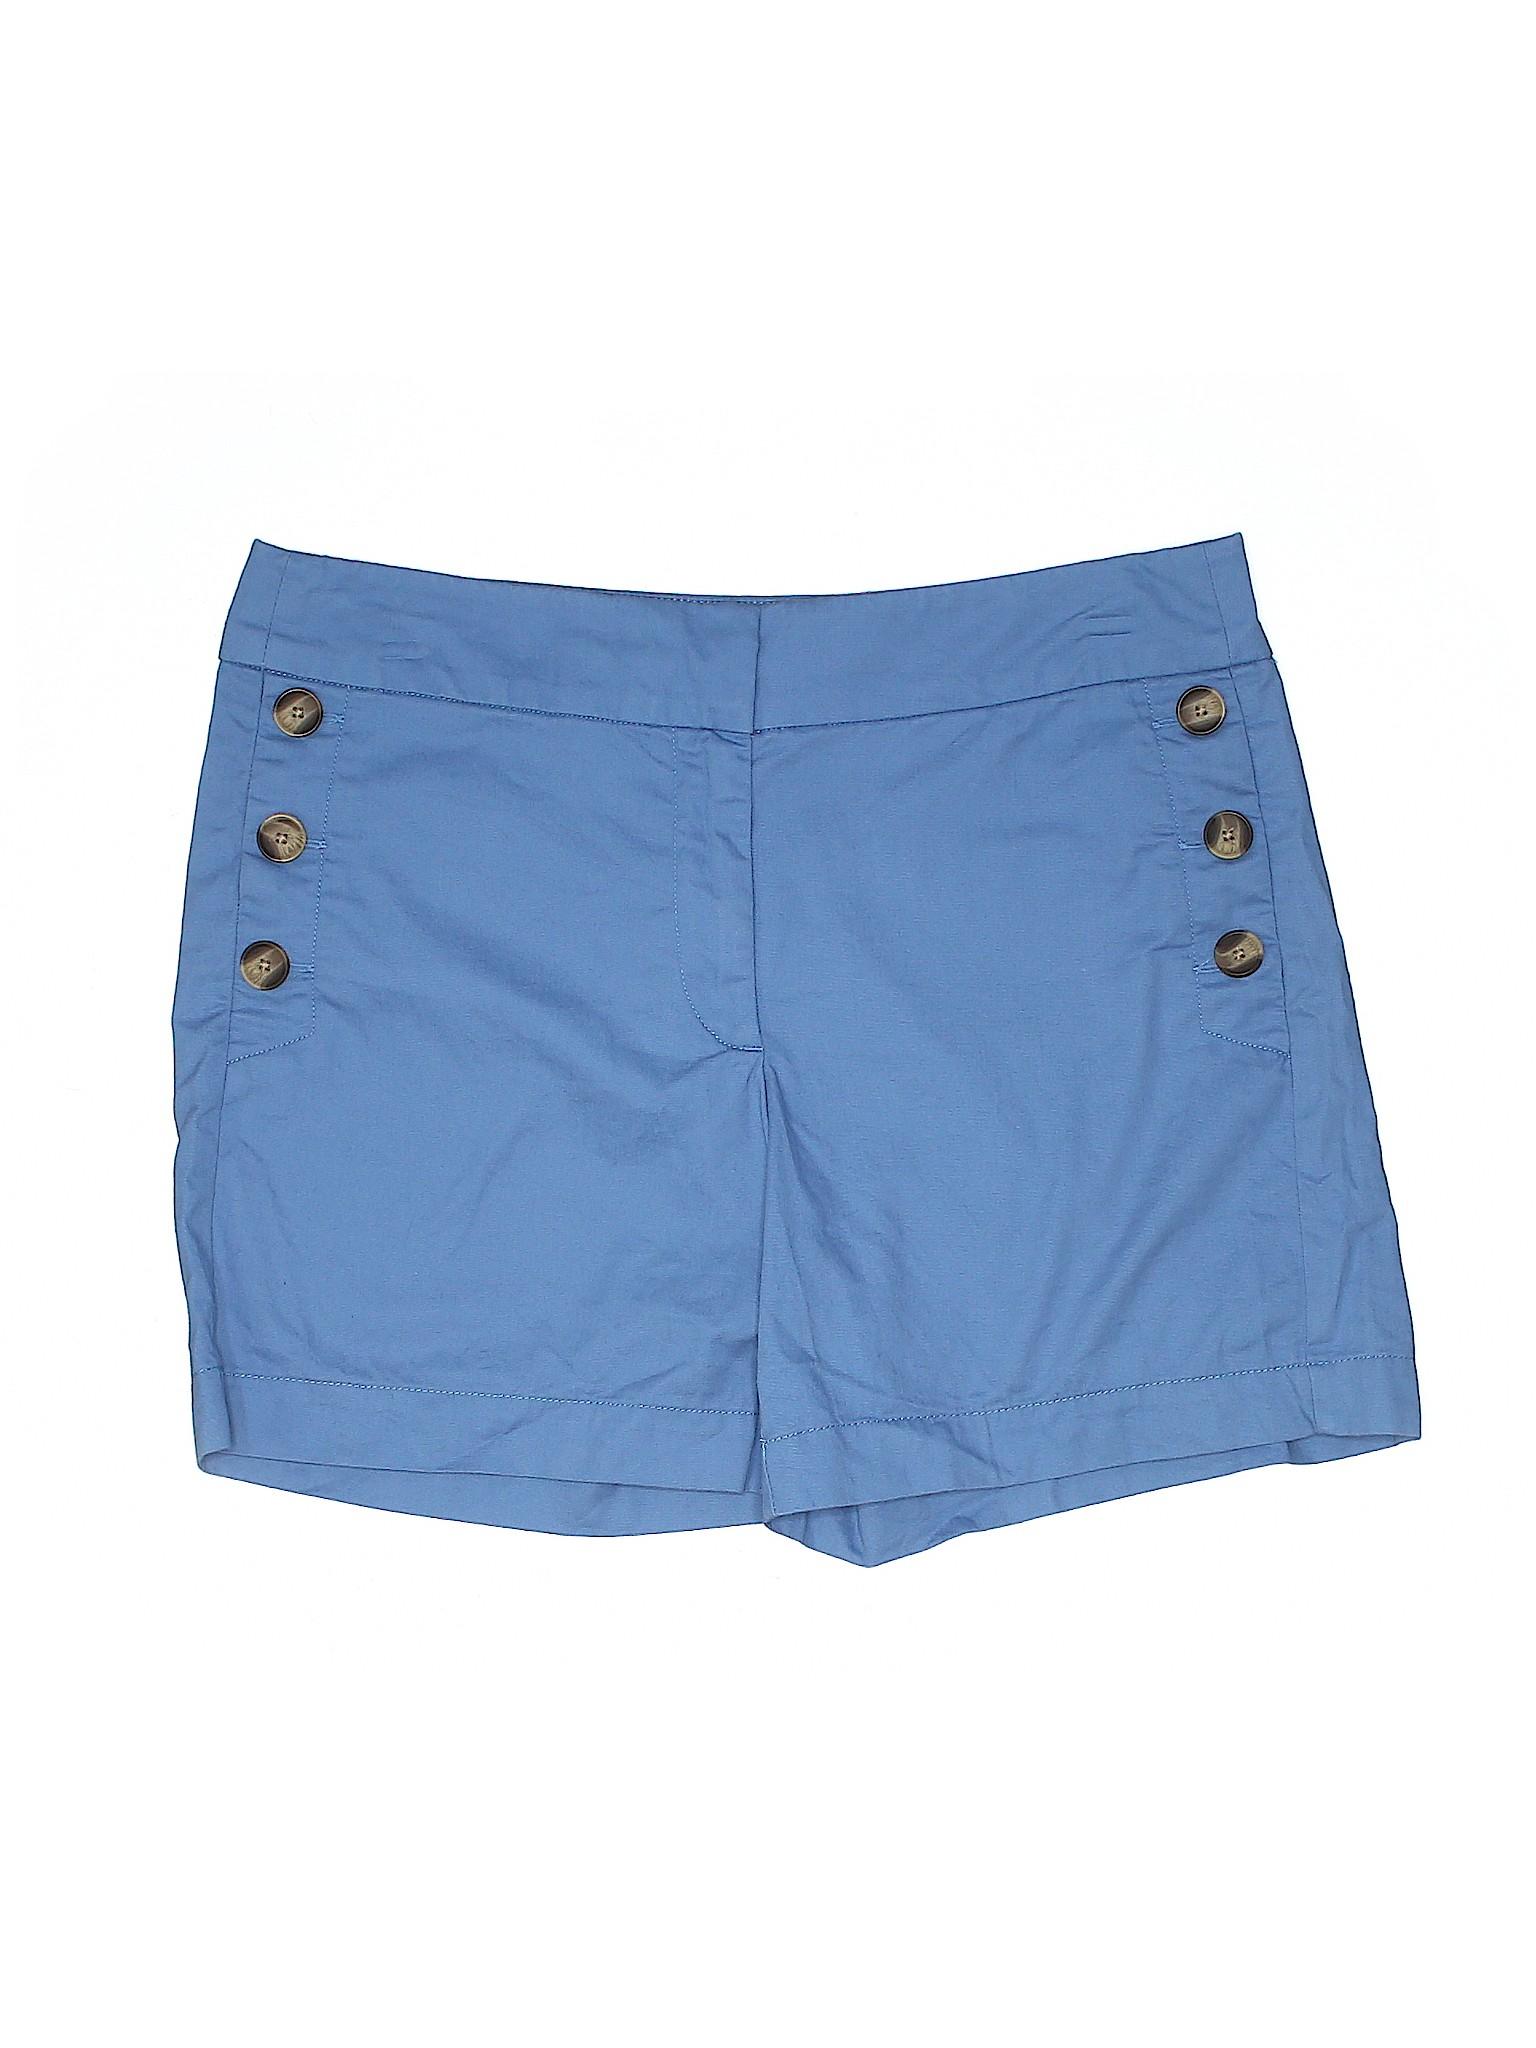 Khaki Shorts Ann Taylor Boutique LOFT wqgTXx00z